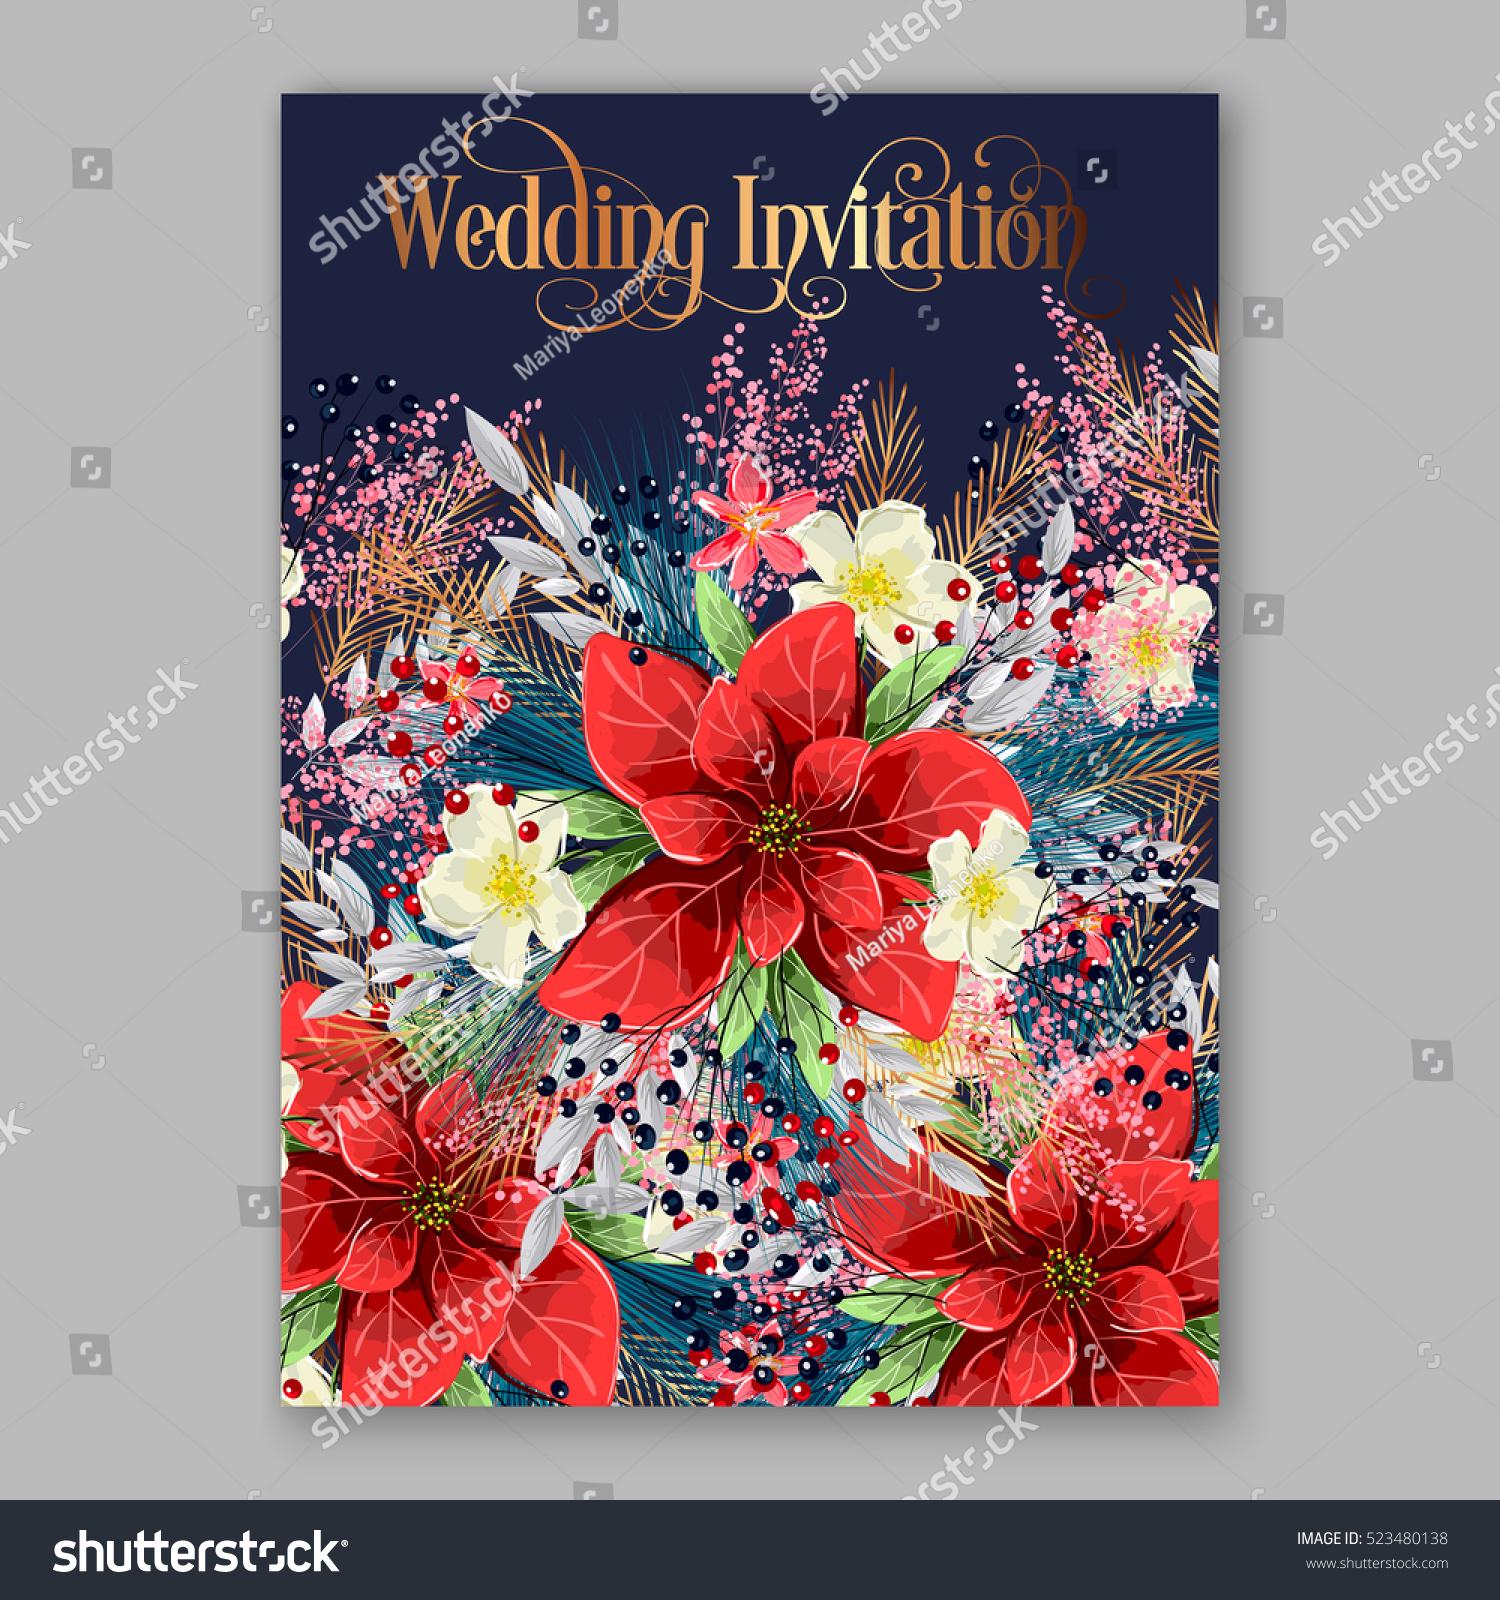 Red Poinsettia Wedding Invitation Sample Card Stock Vector 523480138 ...